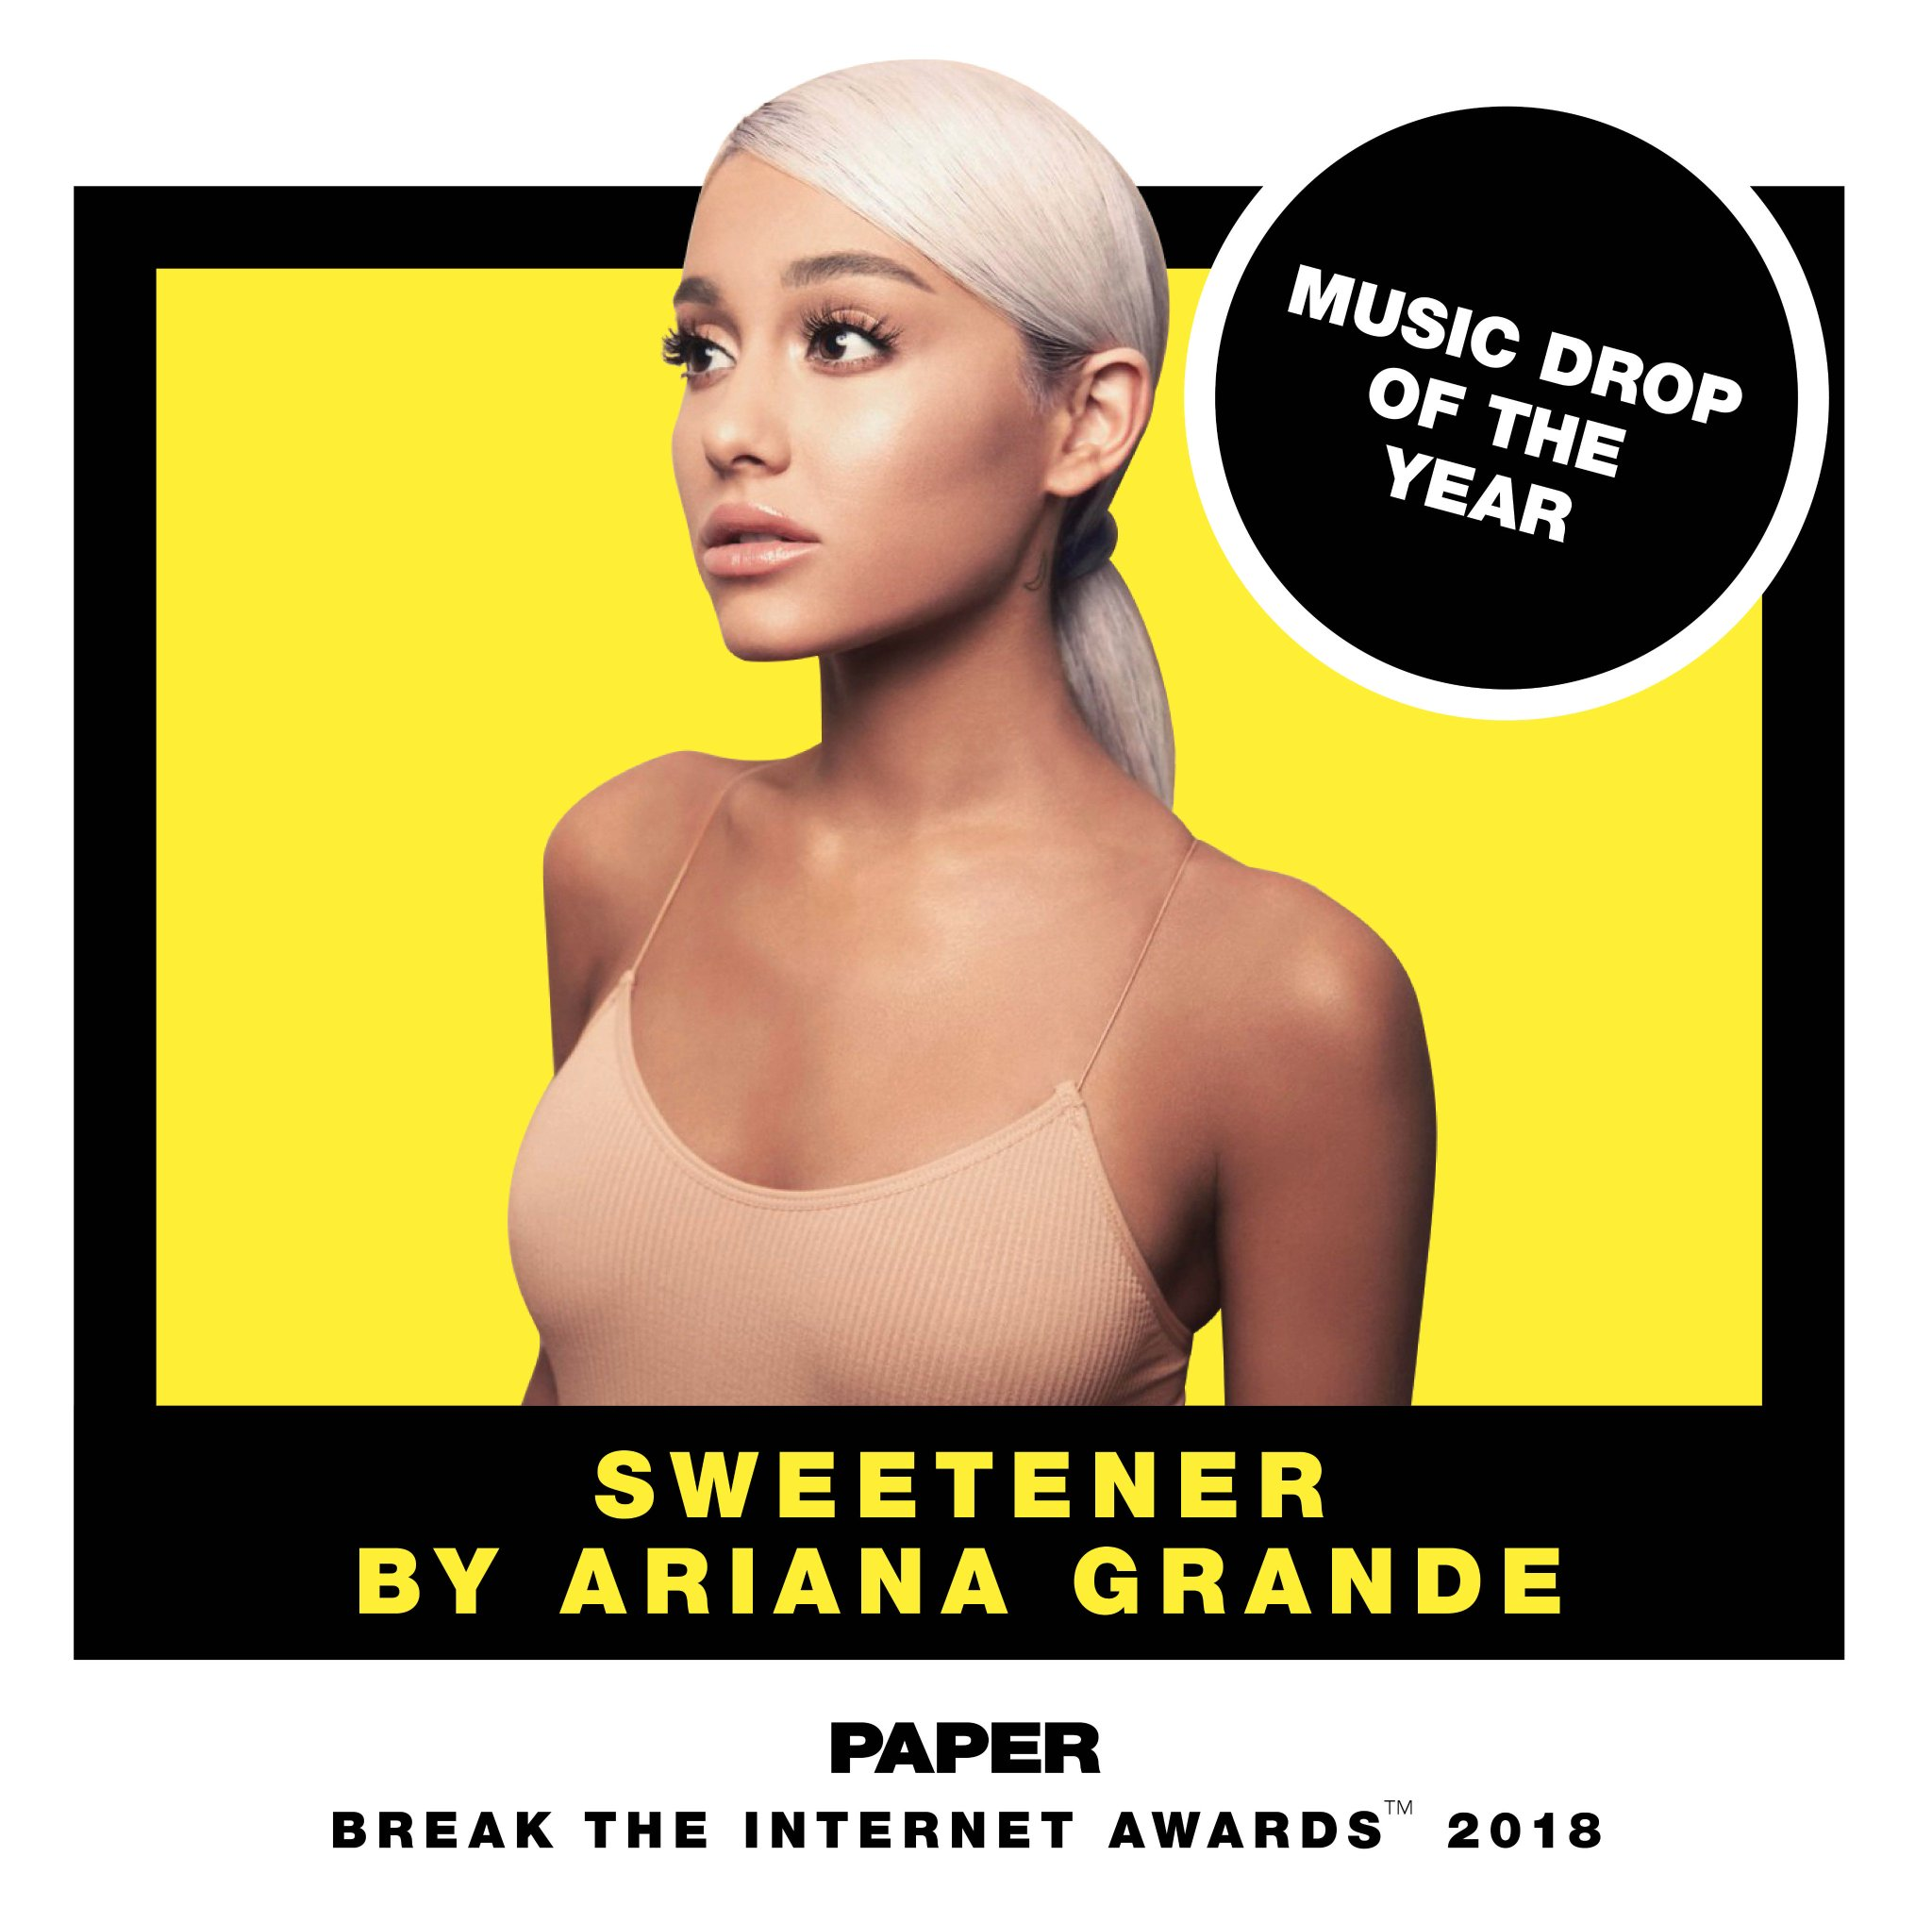 .@ArianaGrande for music drop of the year! #sweetener #breaktheinternet https://t.co/Fnkqv7FGh6 https://t.co/7SljSjwYso